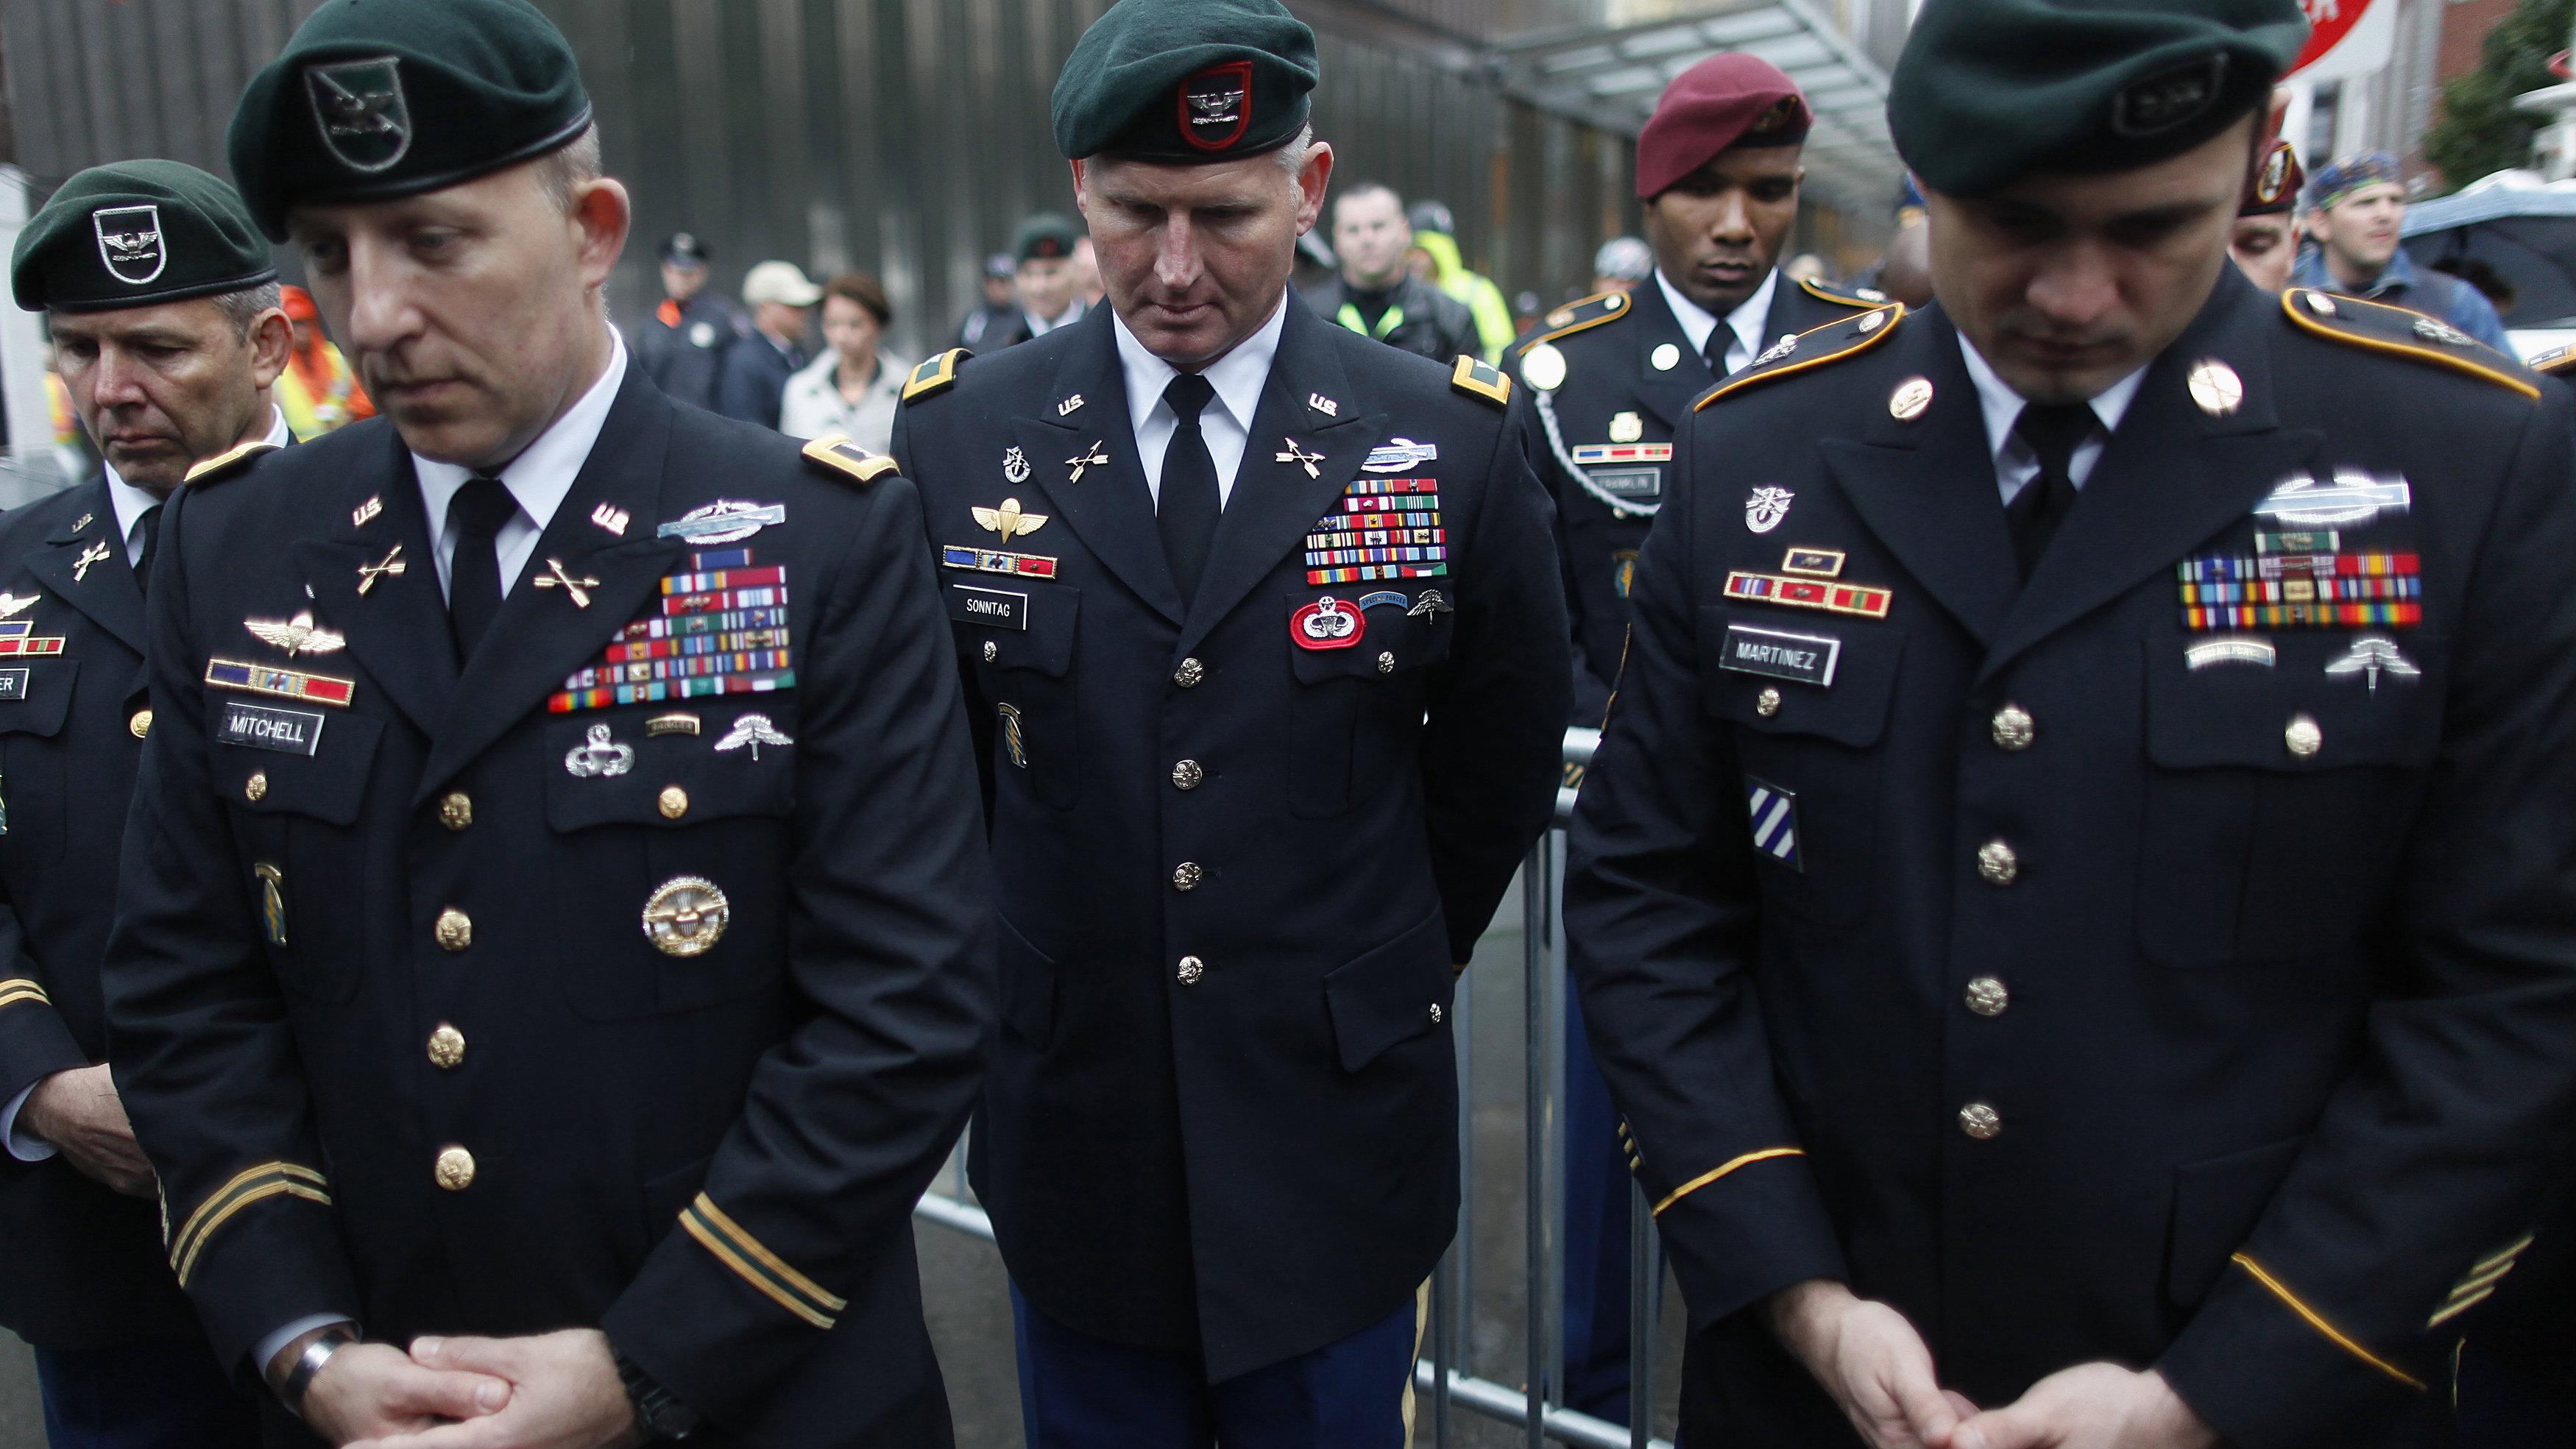 American business needs the Green Berets — Quartz